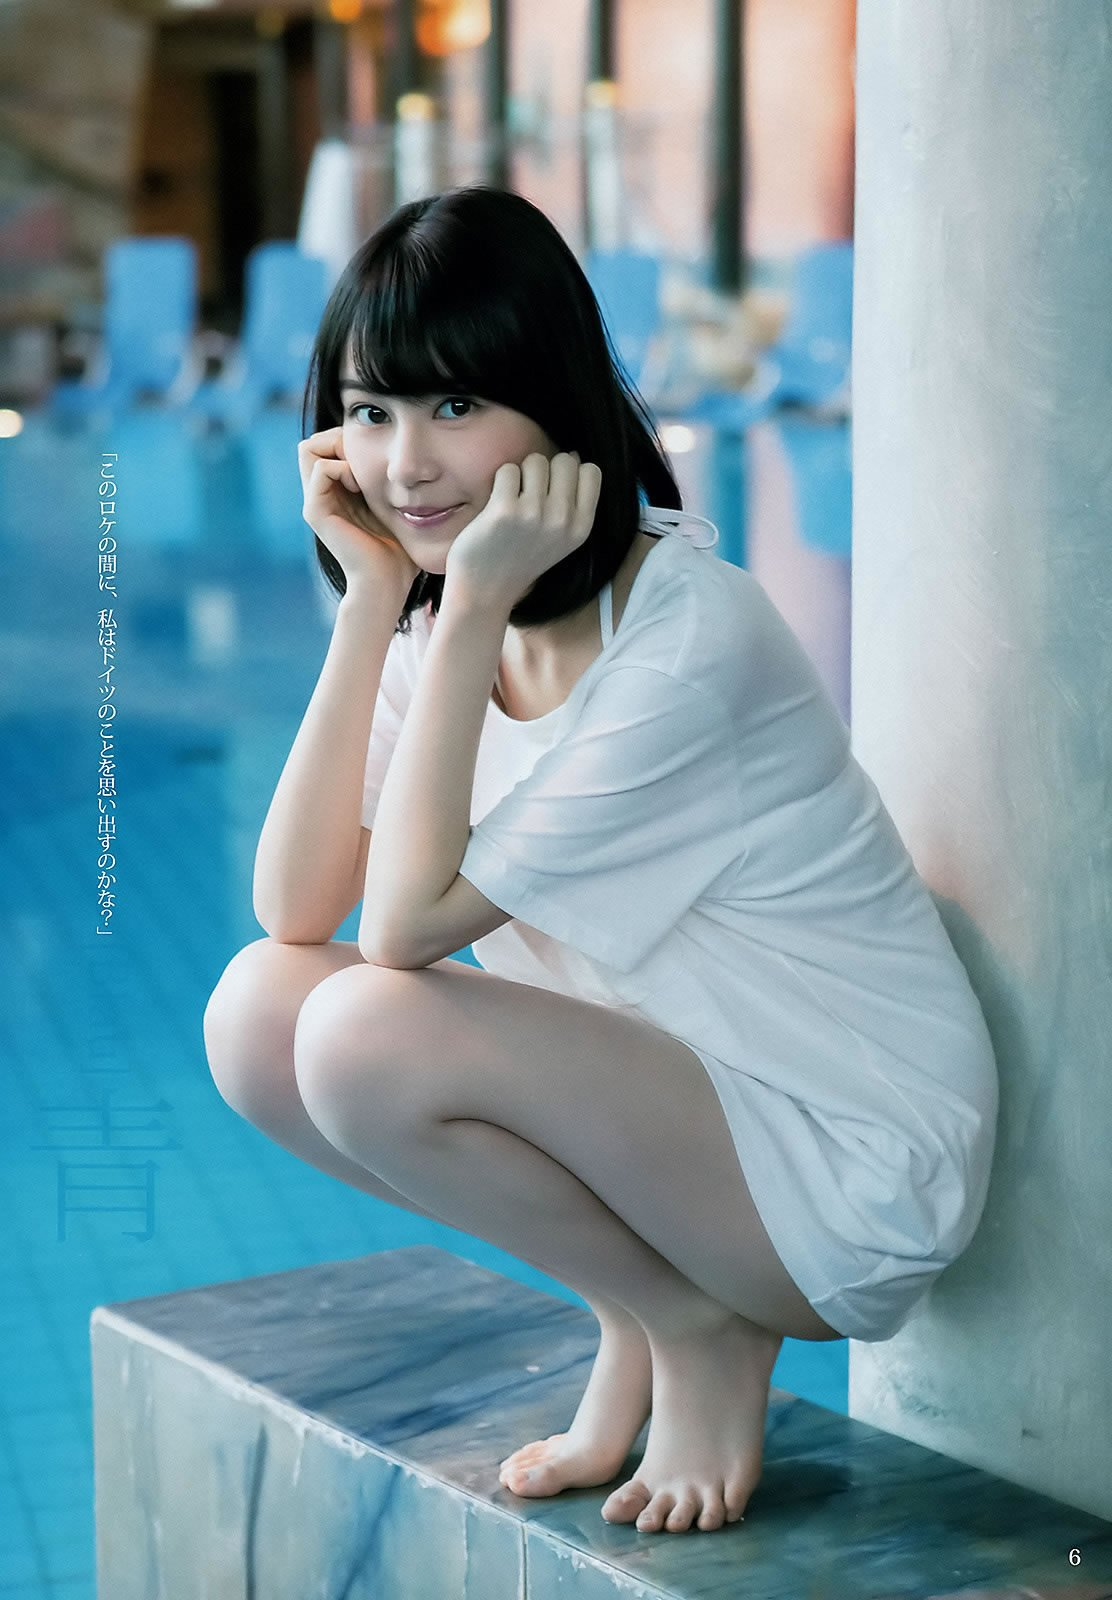 girl-m88bet-6